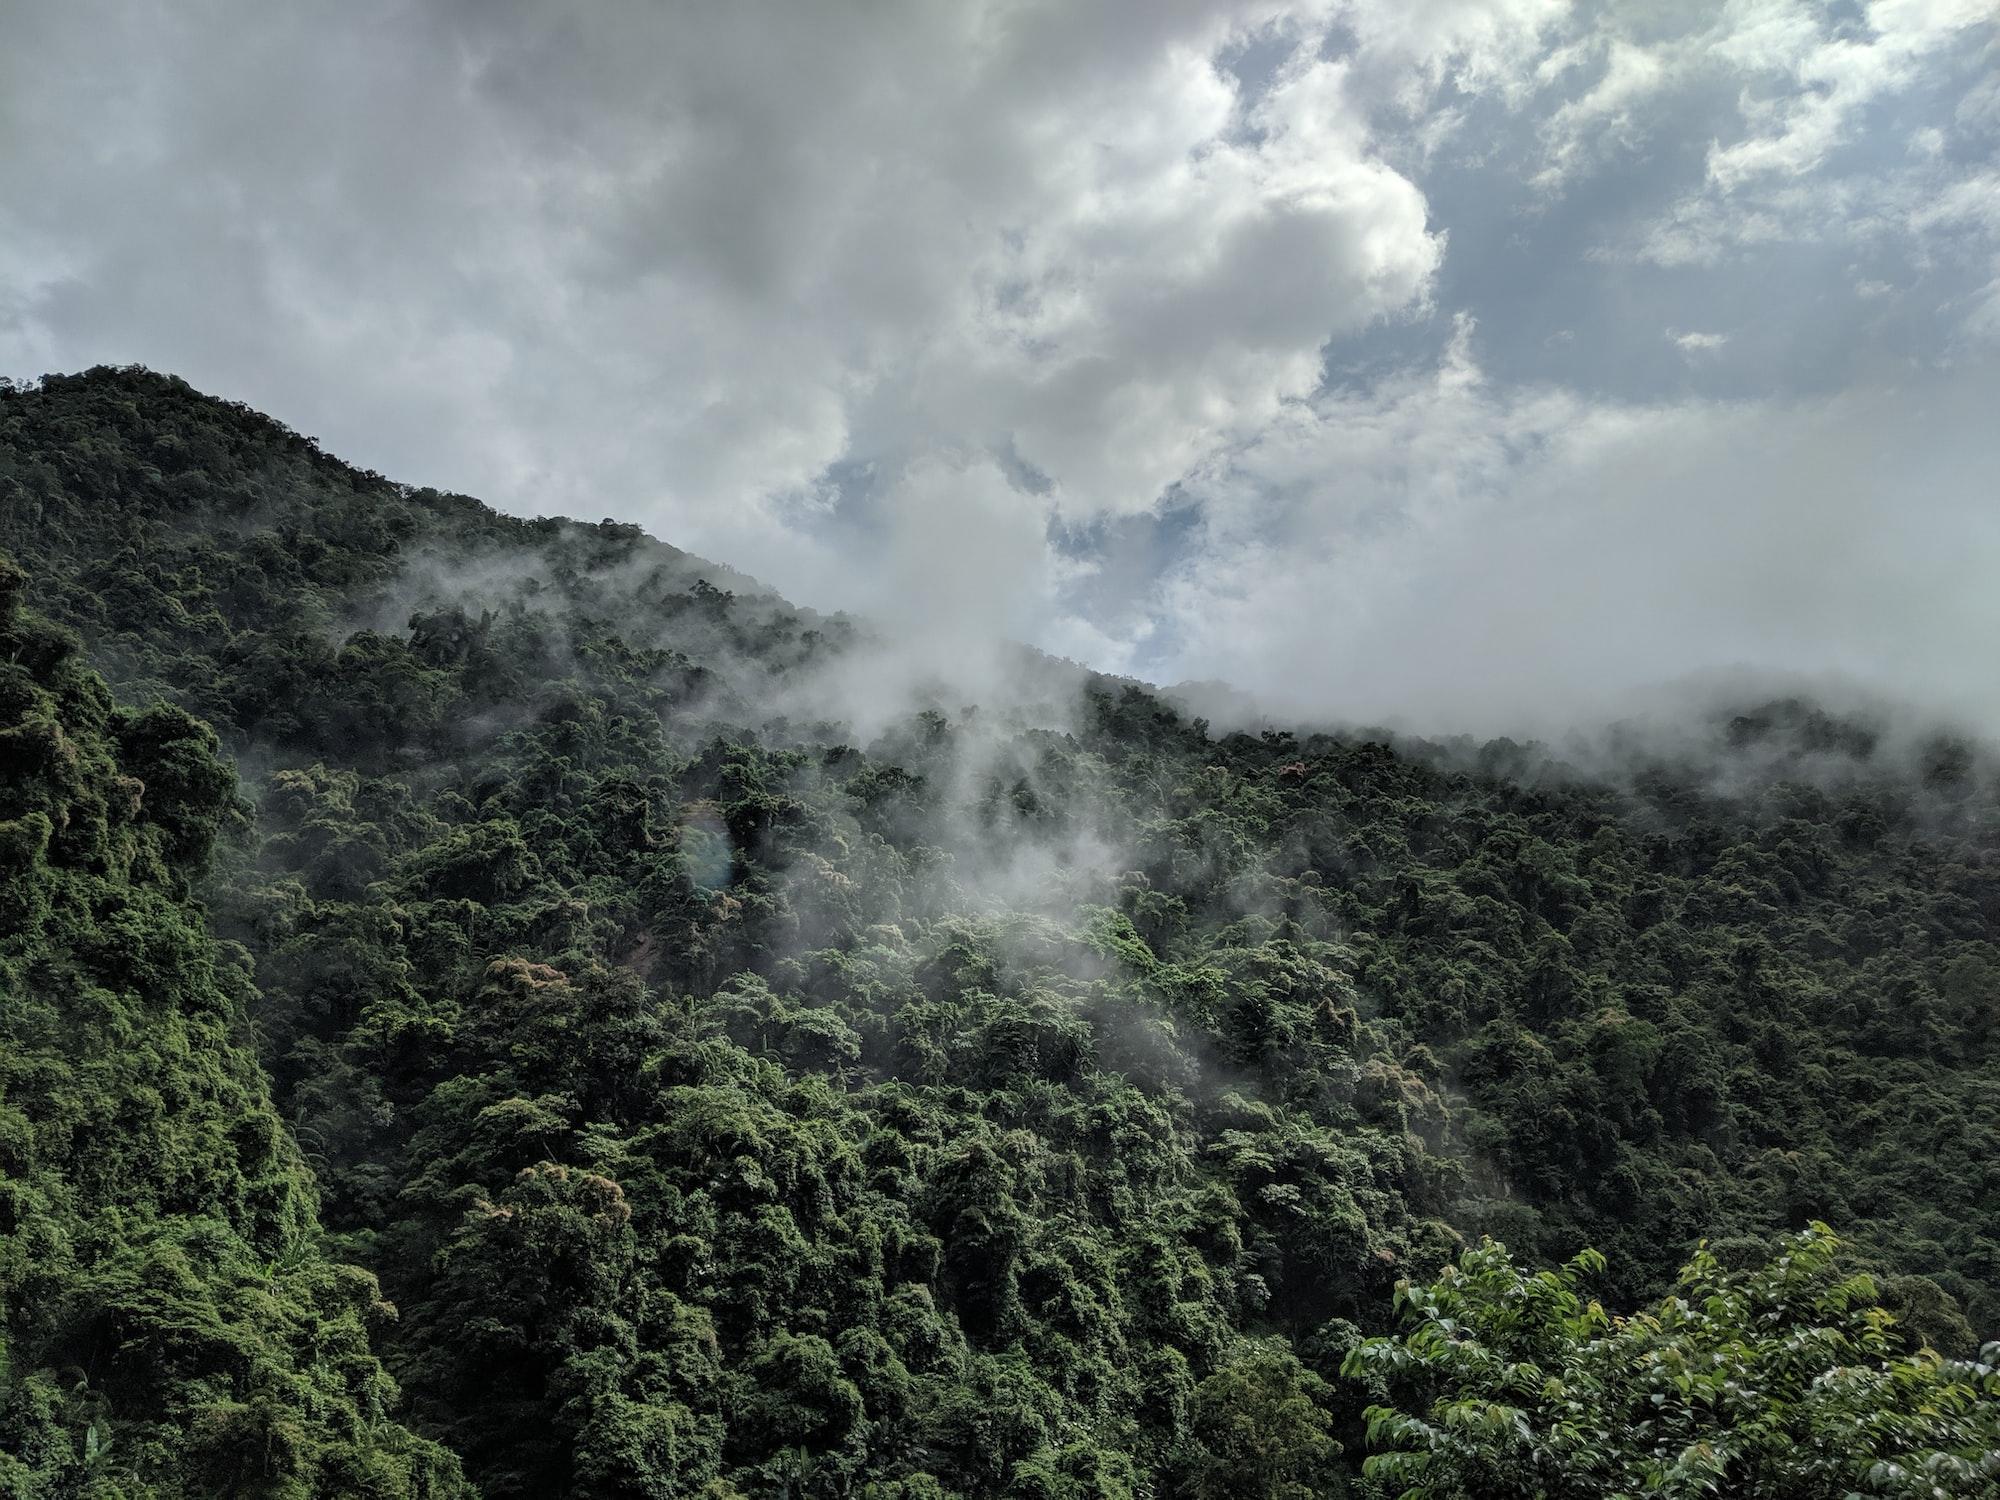 Evaporation after a heavy rainfall. Wulai, Taiwan.